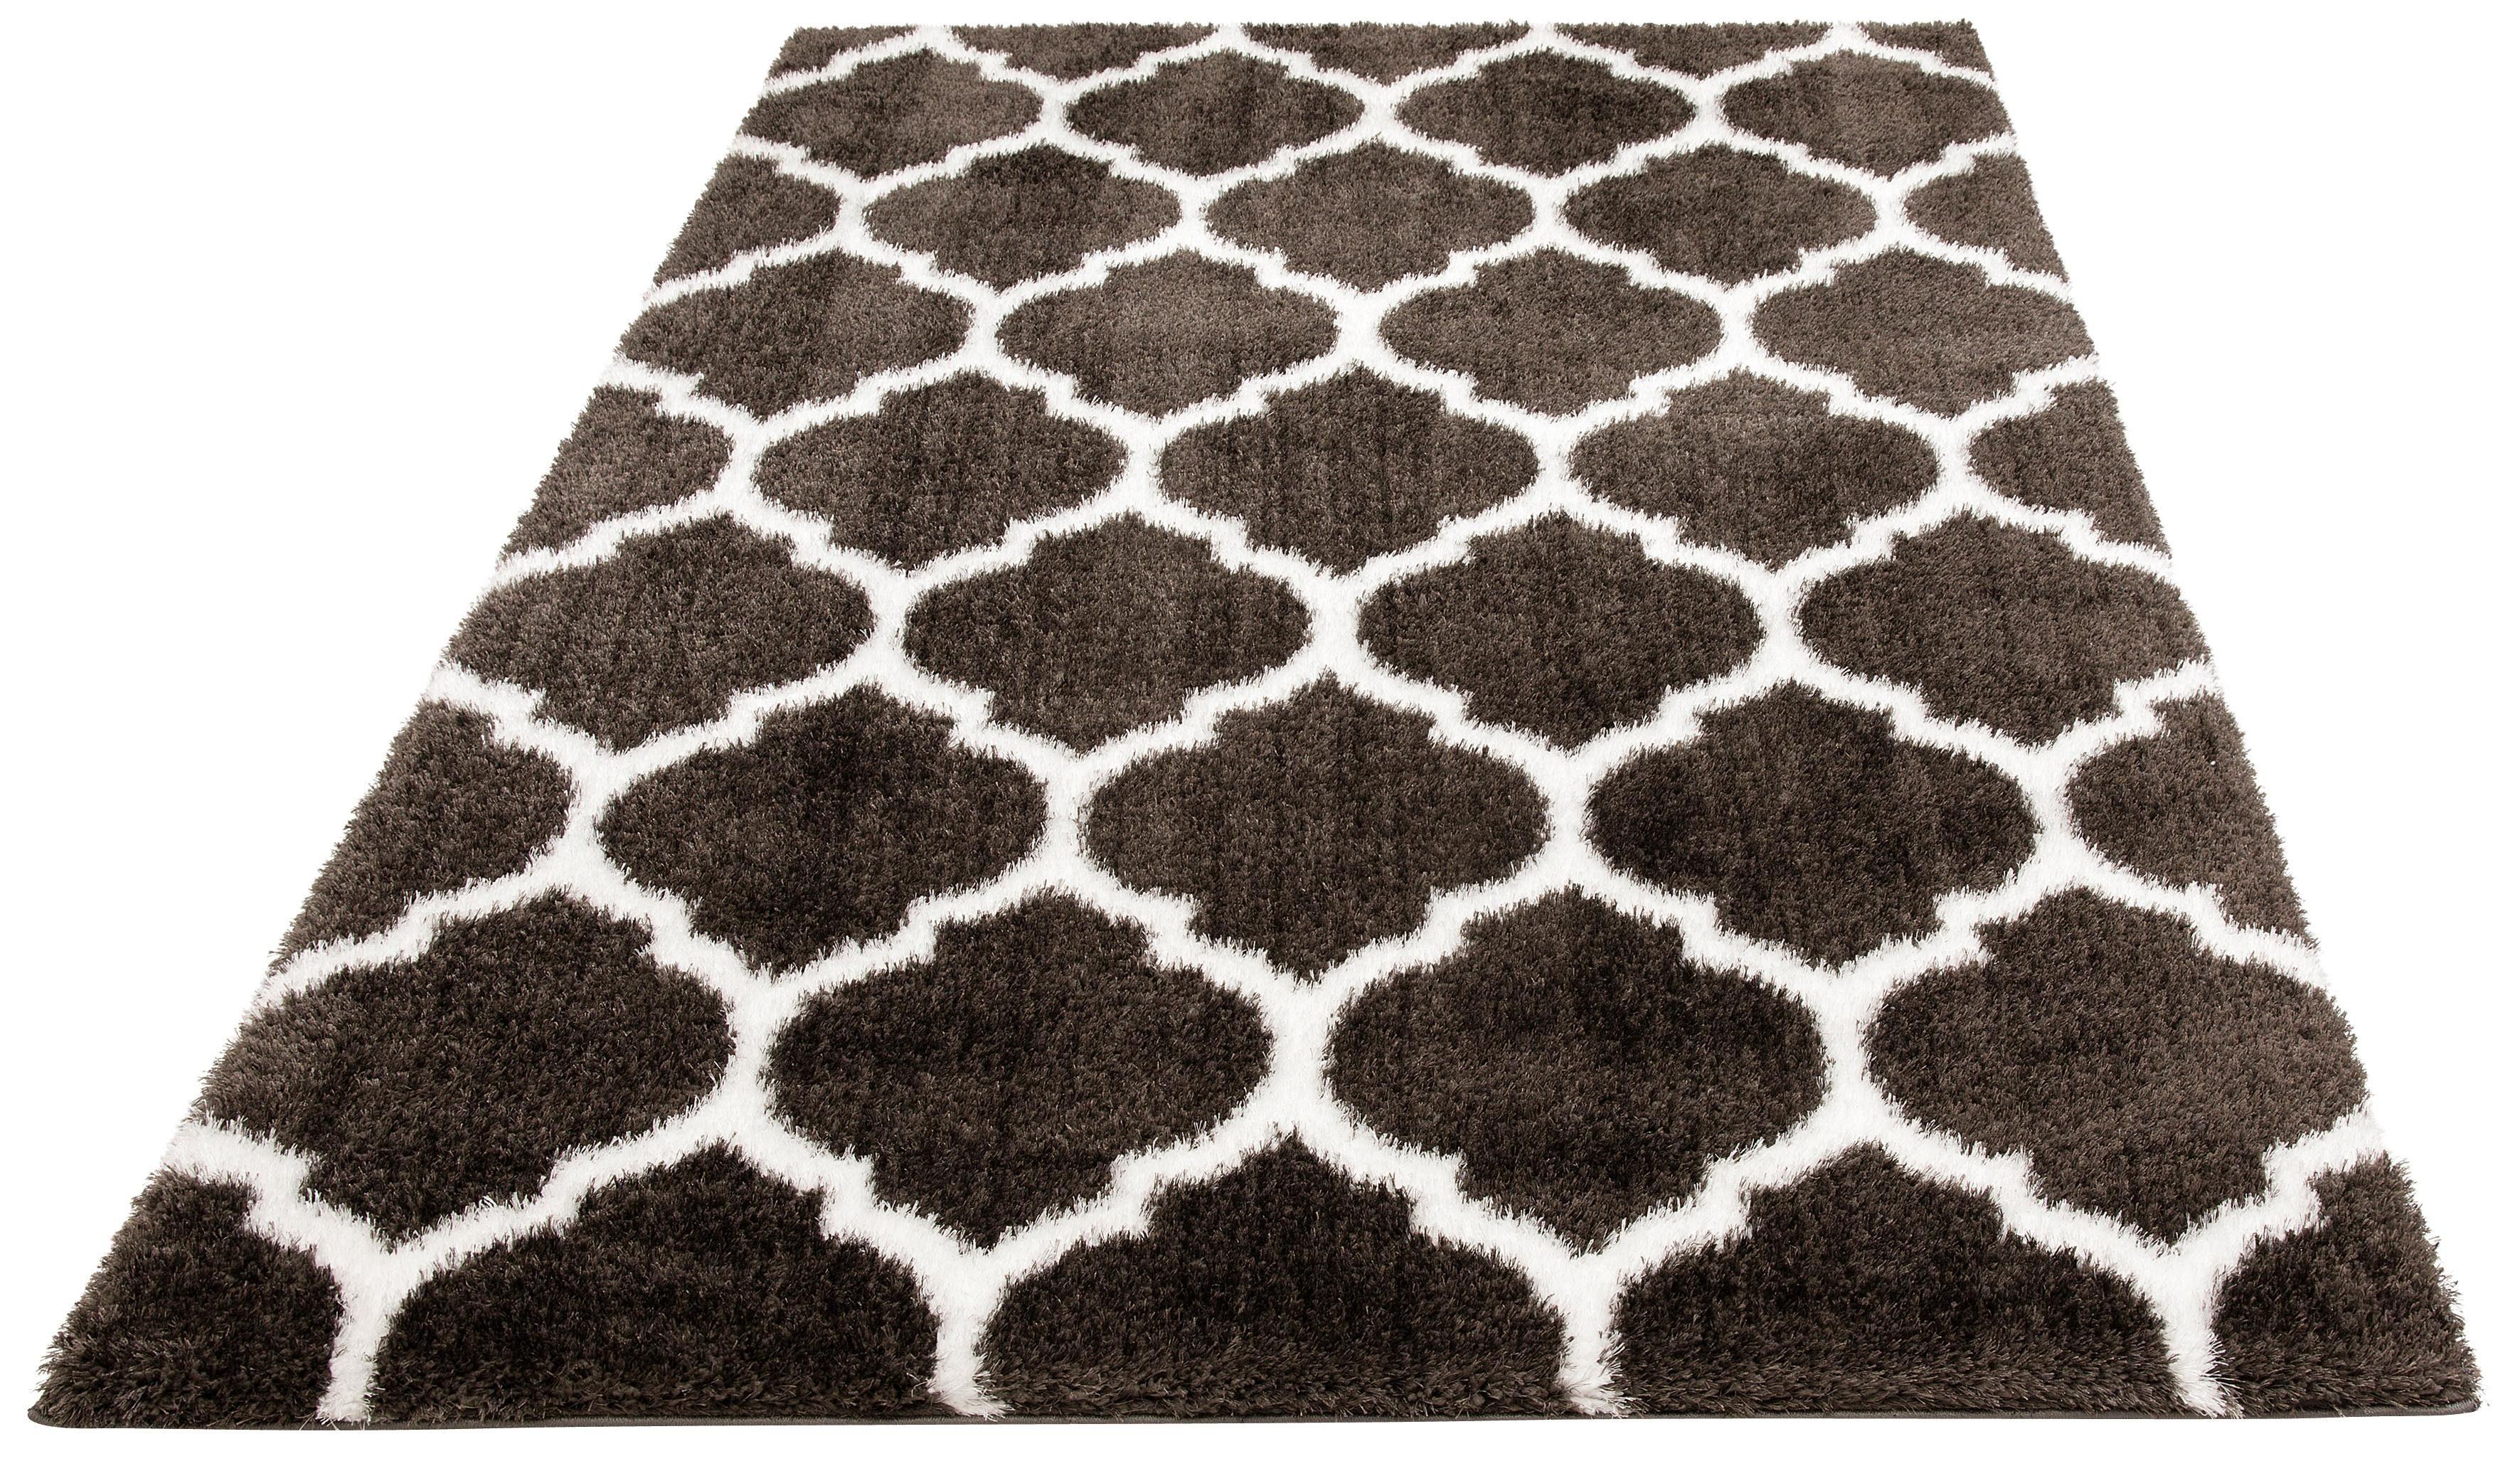 Hochflor-Teppich Soraya Leonique rechteckig Höhe 43 mm maschinell gewebt